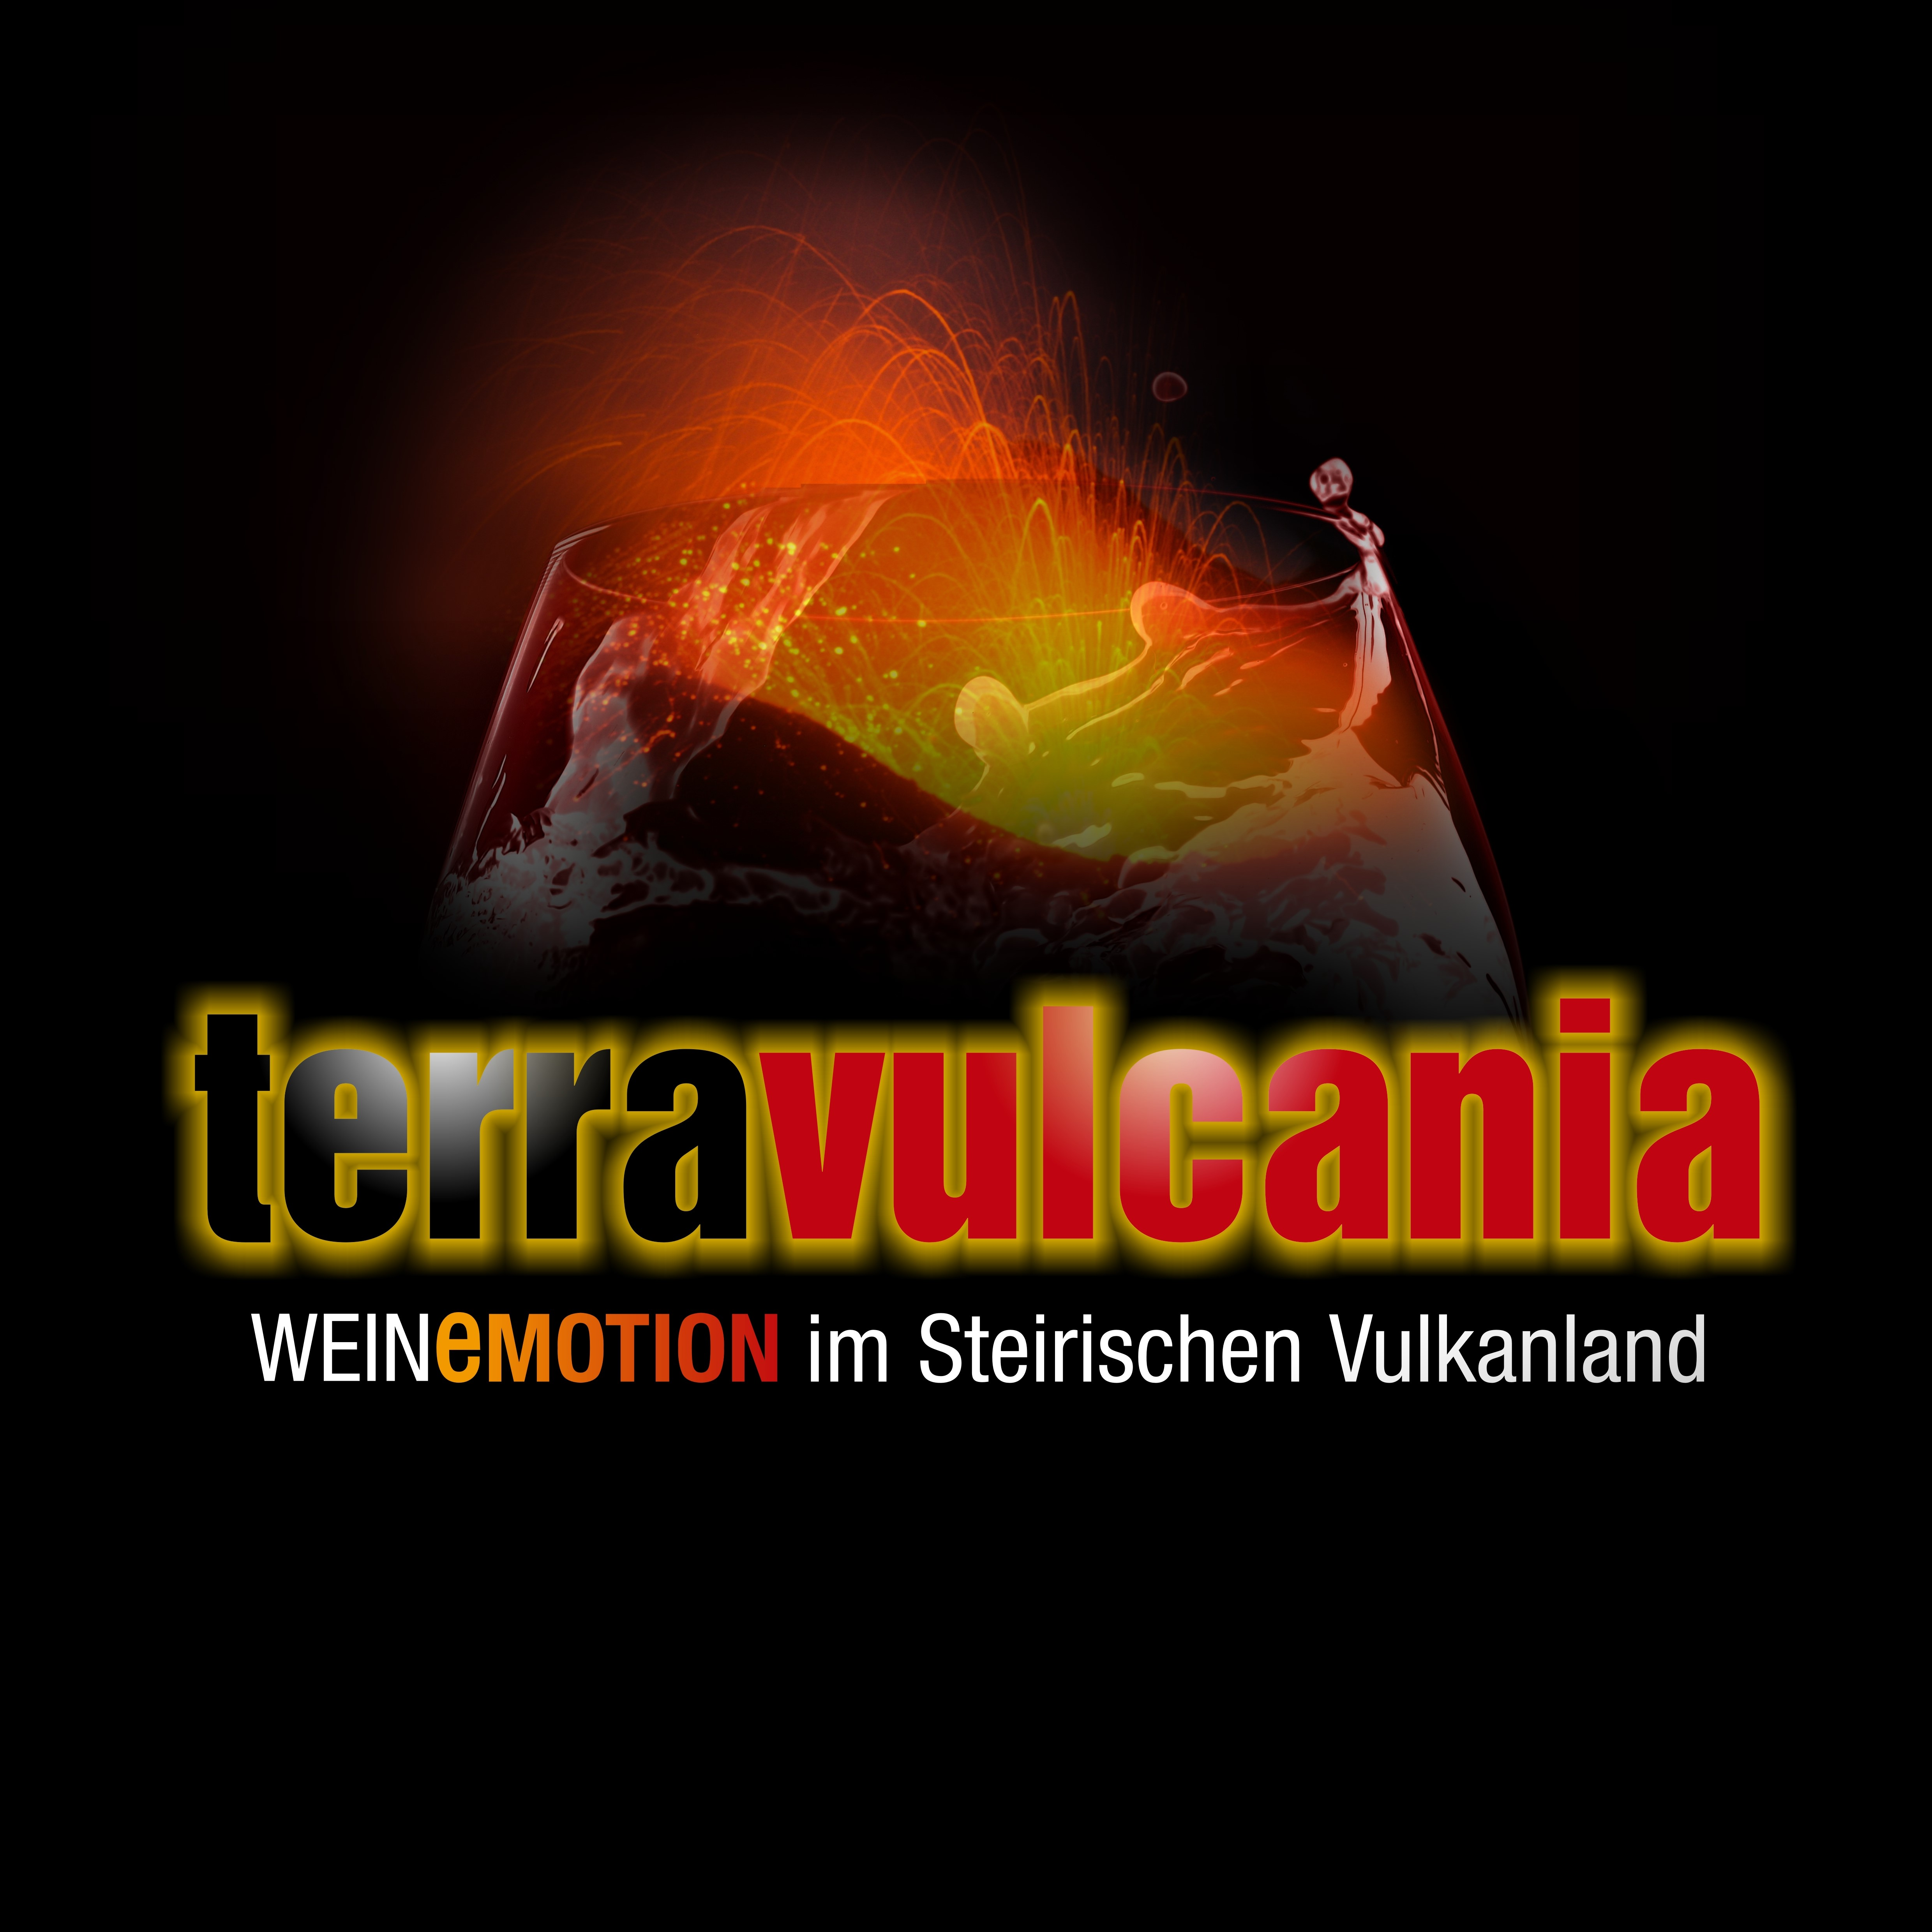 terravulcania-Logo-4c-Weinemotion (2)